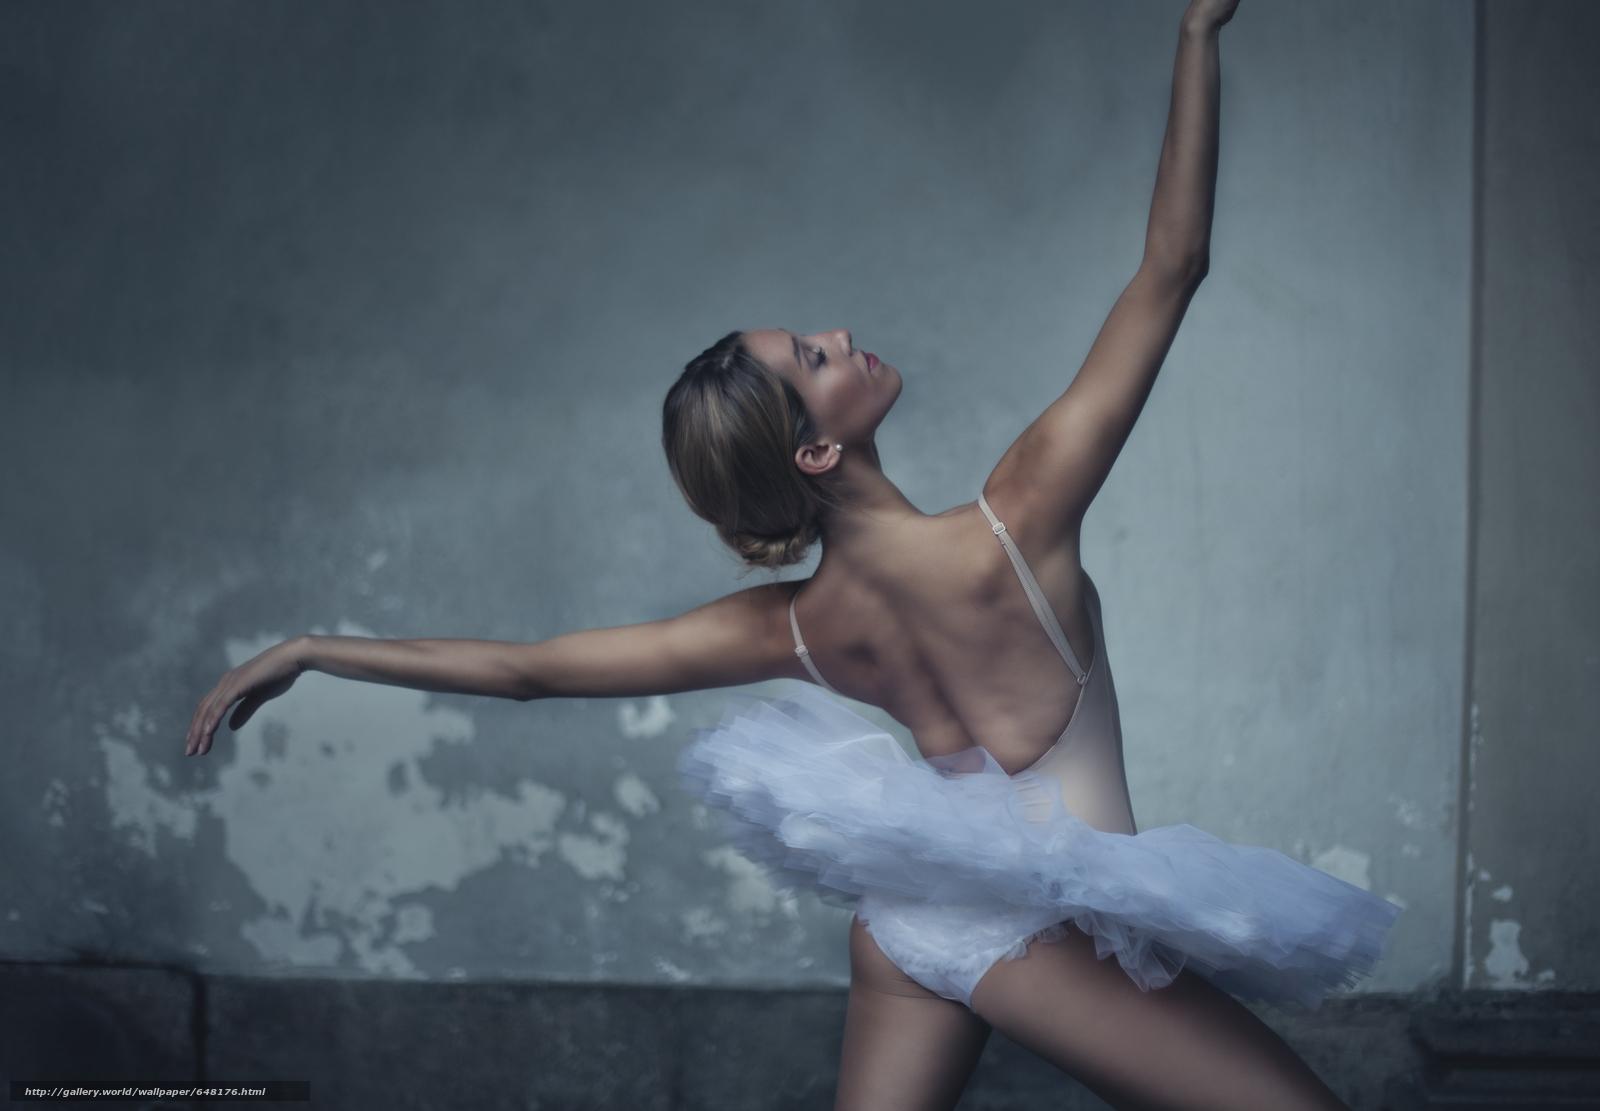 Download wallpaper girl,  ballerina,  ballet,  dance free desktop wallpaper in the resolution 5182x3599 — picture №648176